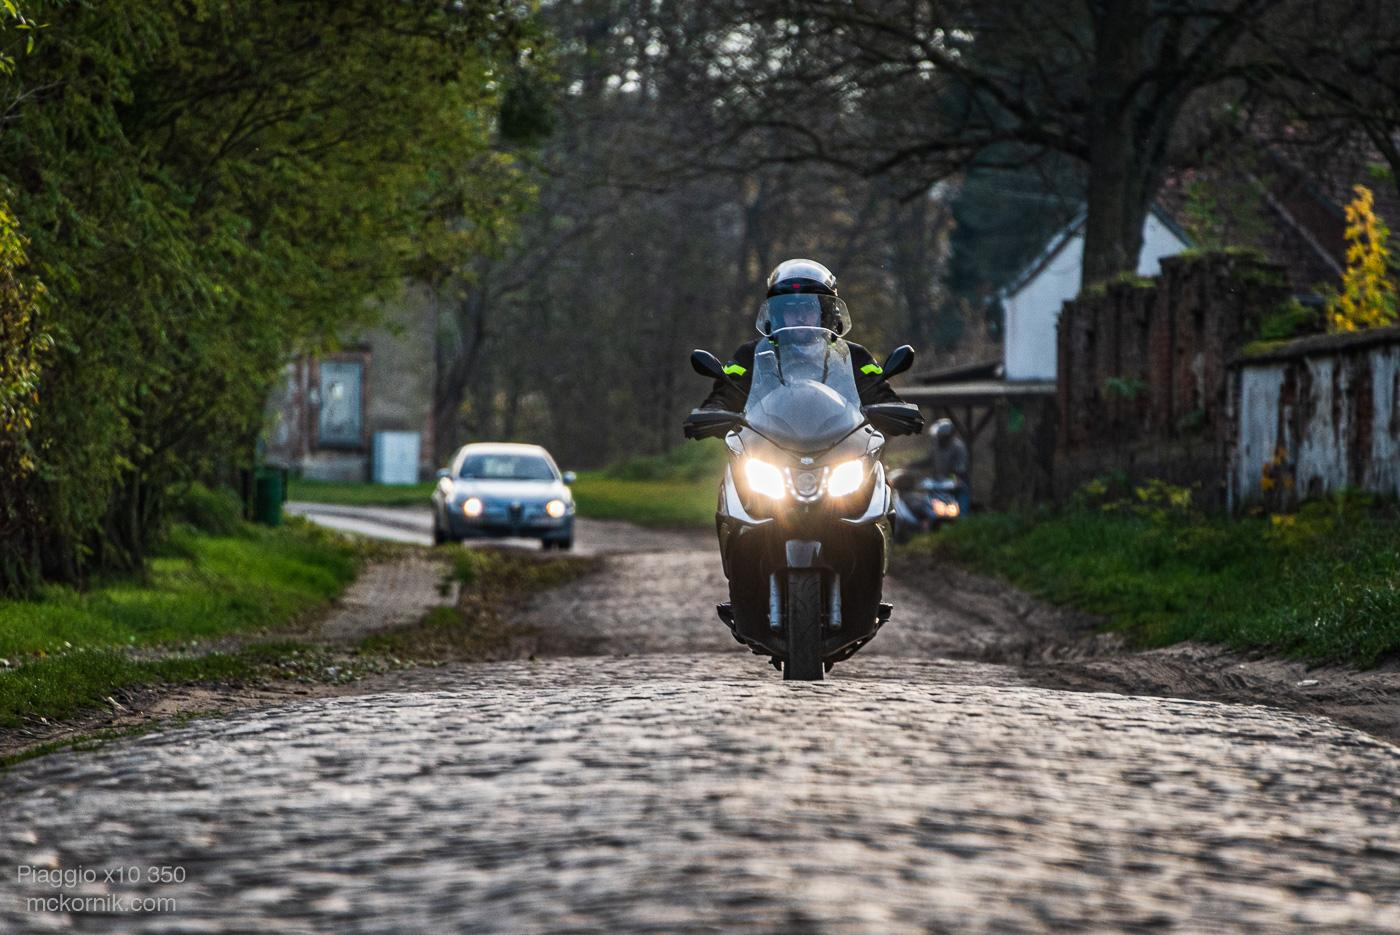 Autumn scooter / motocycle ride #piaggiox10, #piaggiox10350 and #yamahaxj600n #calimotour